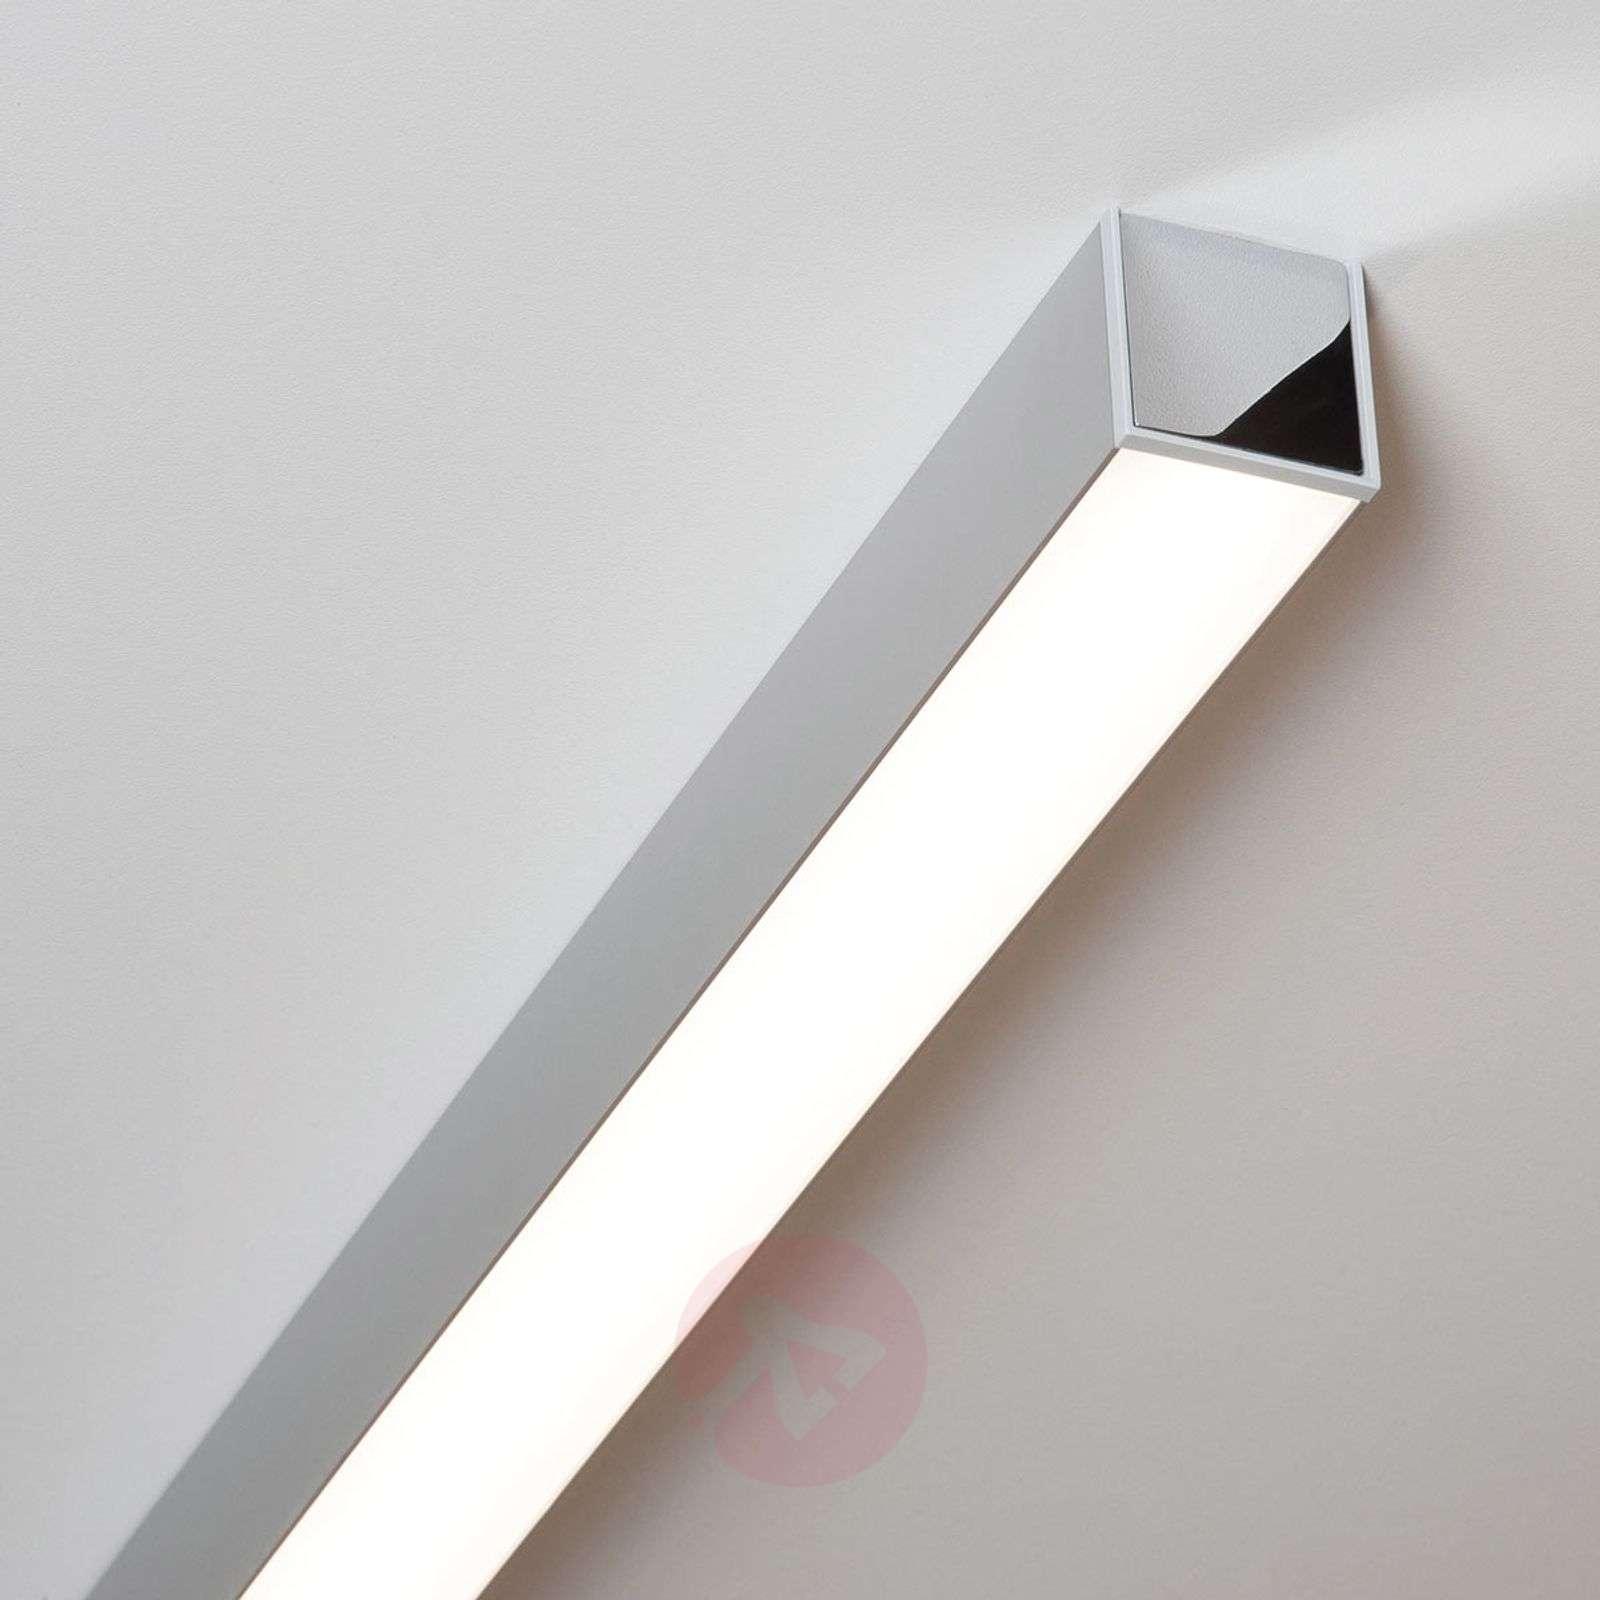 LED-kattolamppu Ride, 113,7 cm, eloksoitu alumiini-6523816-01